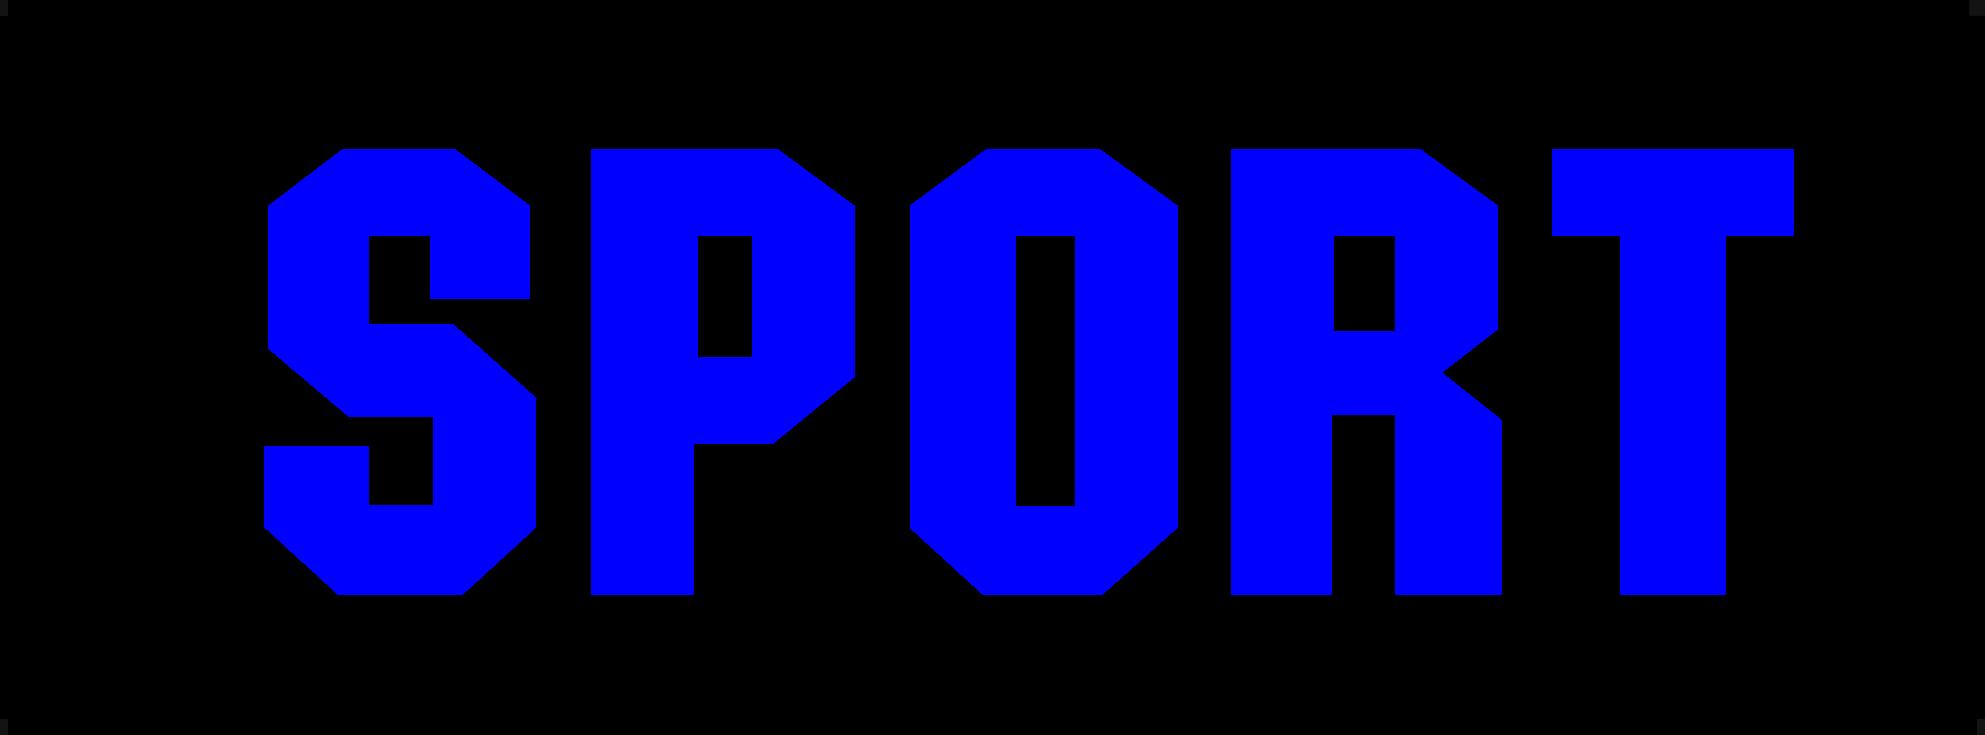 sport blue on black machinejpg